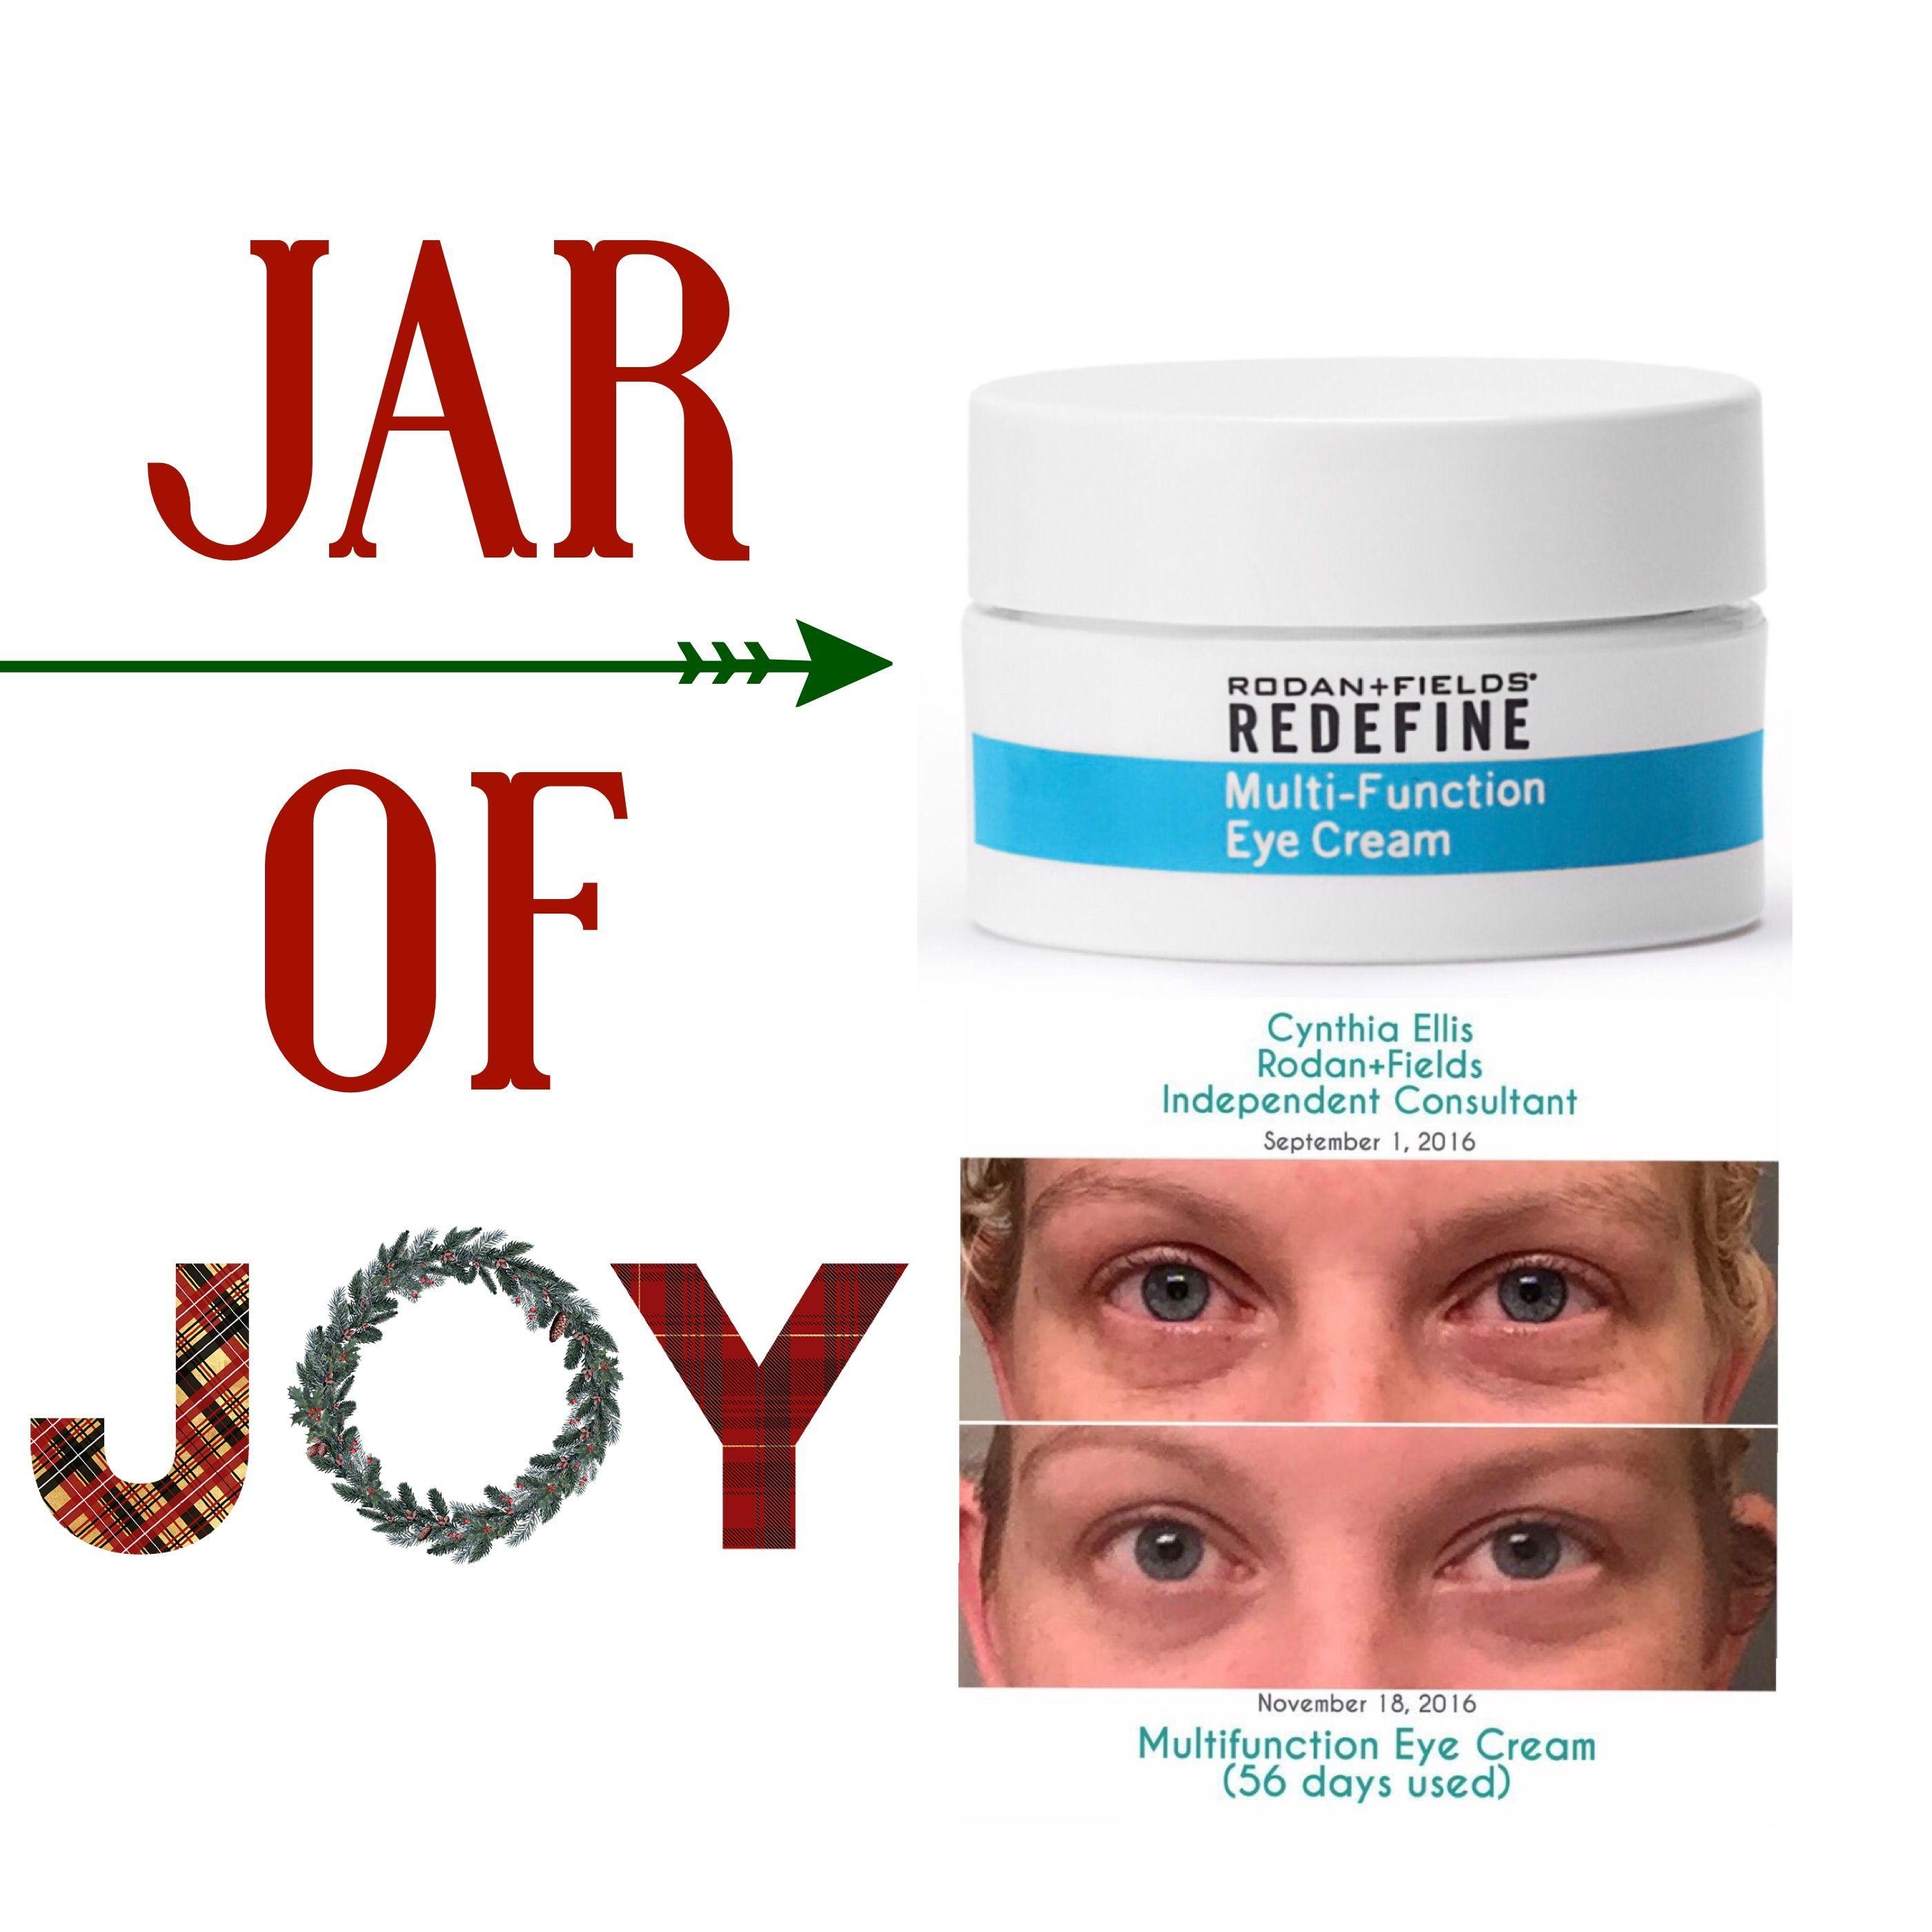 Rodan Fields Multifunction Eye Cream Tackles Those Fine Lines